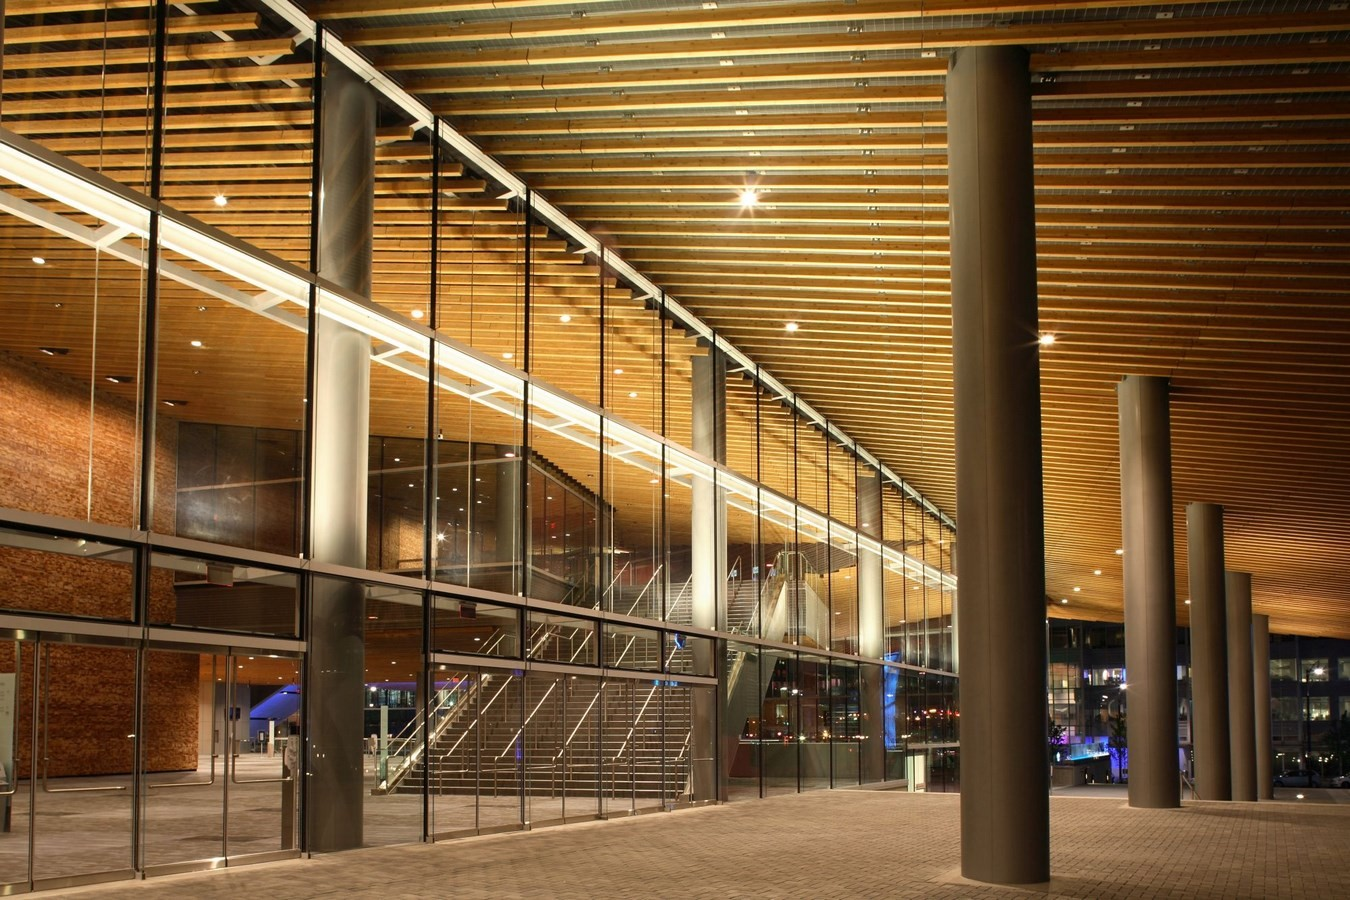 Vancouver Convention Centre, Vancouver, Canada - Sheet1